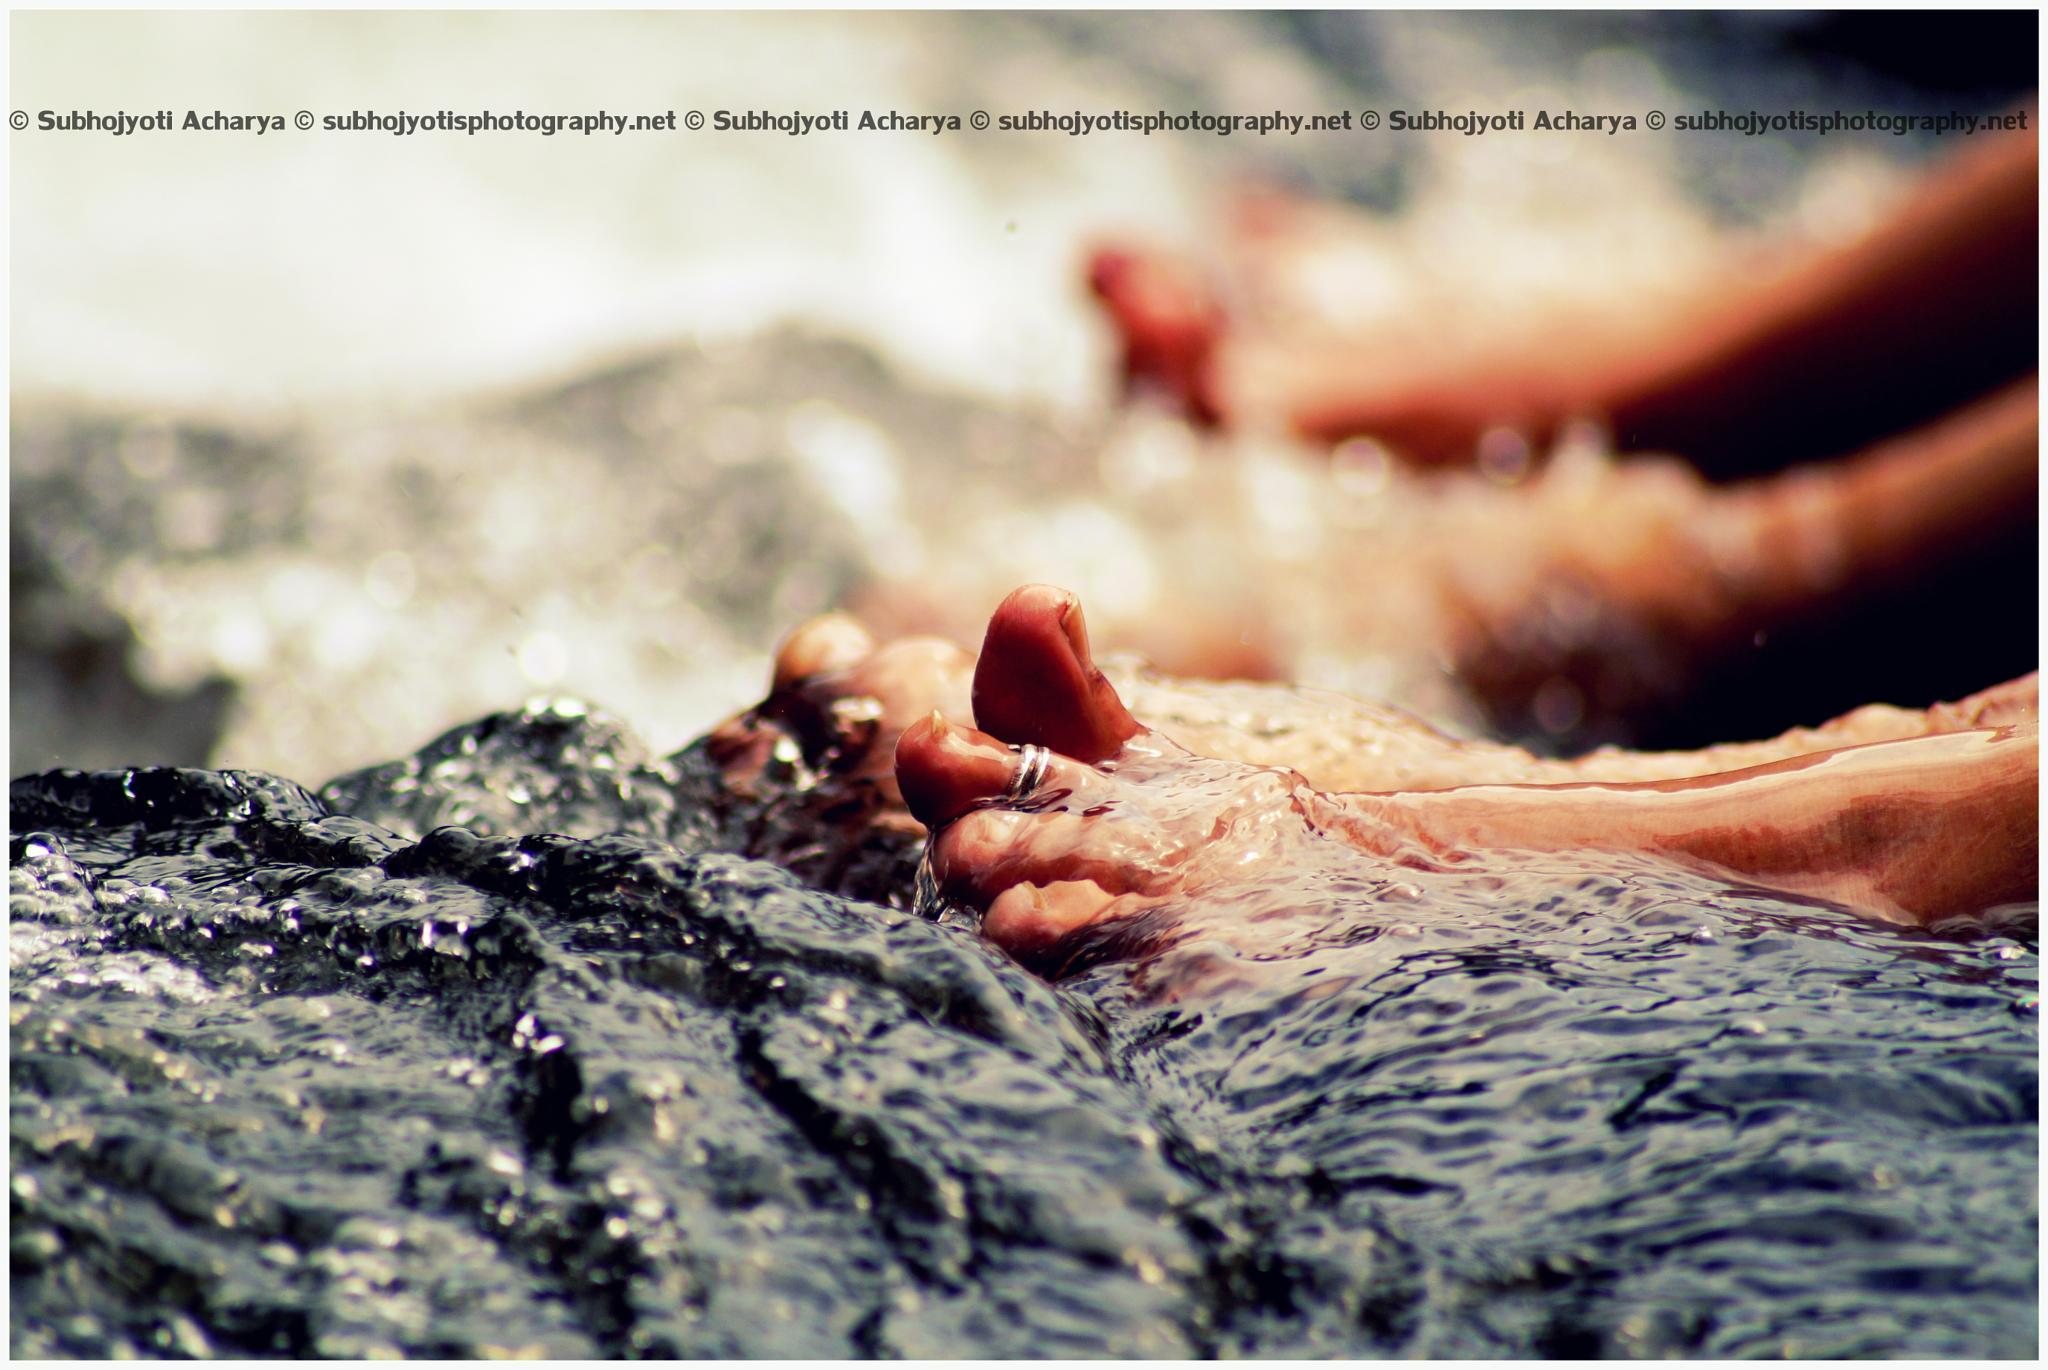 Happy Feet by Subhojyoti Acharya